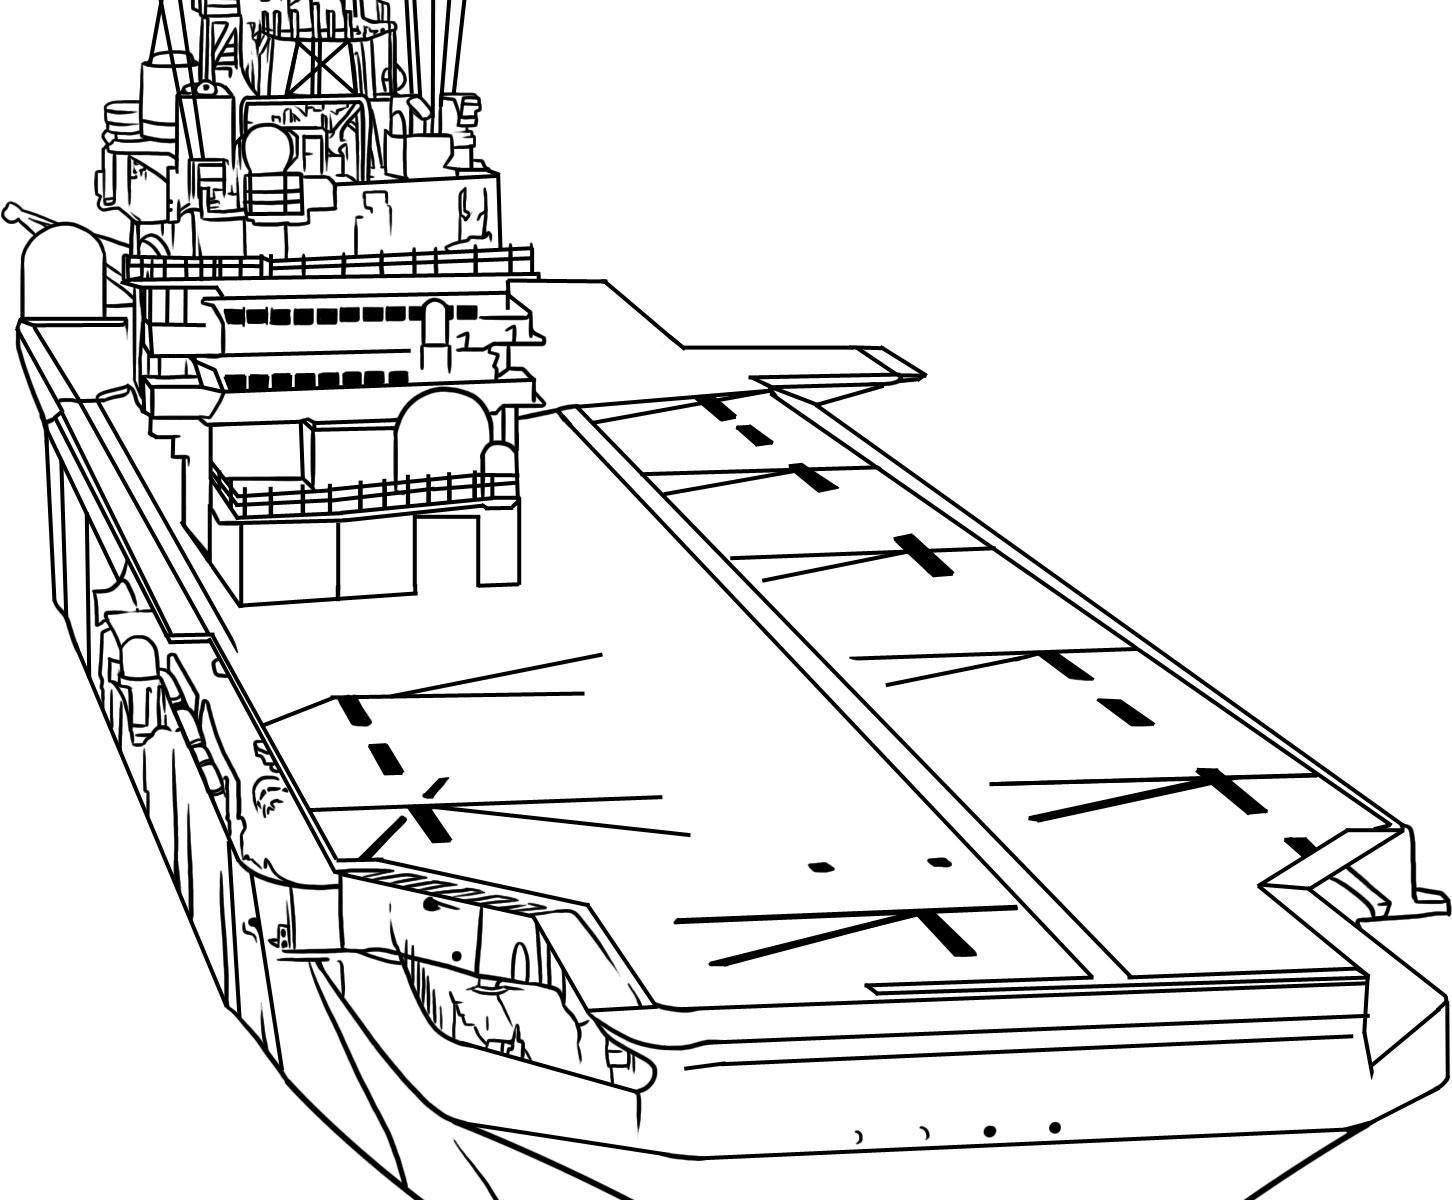 Aircraft Carrier Drawing At Getdrawings